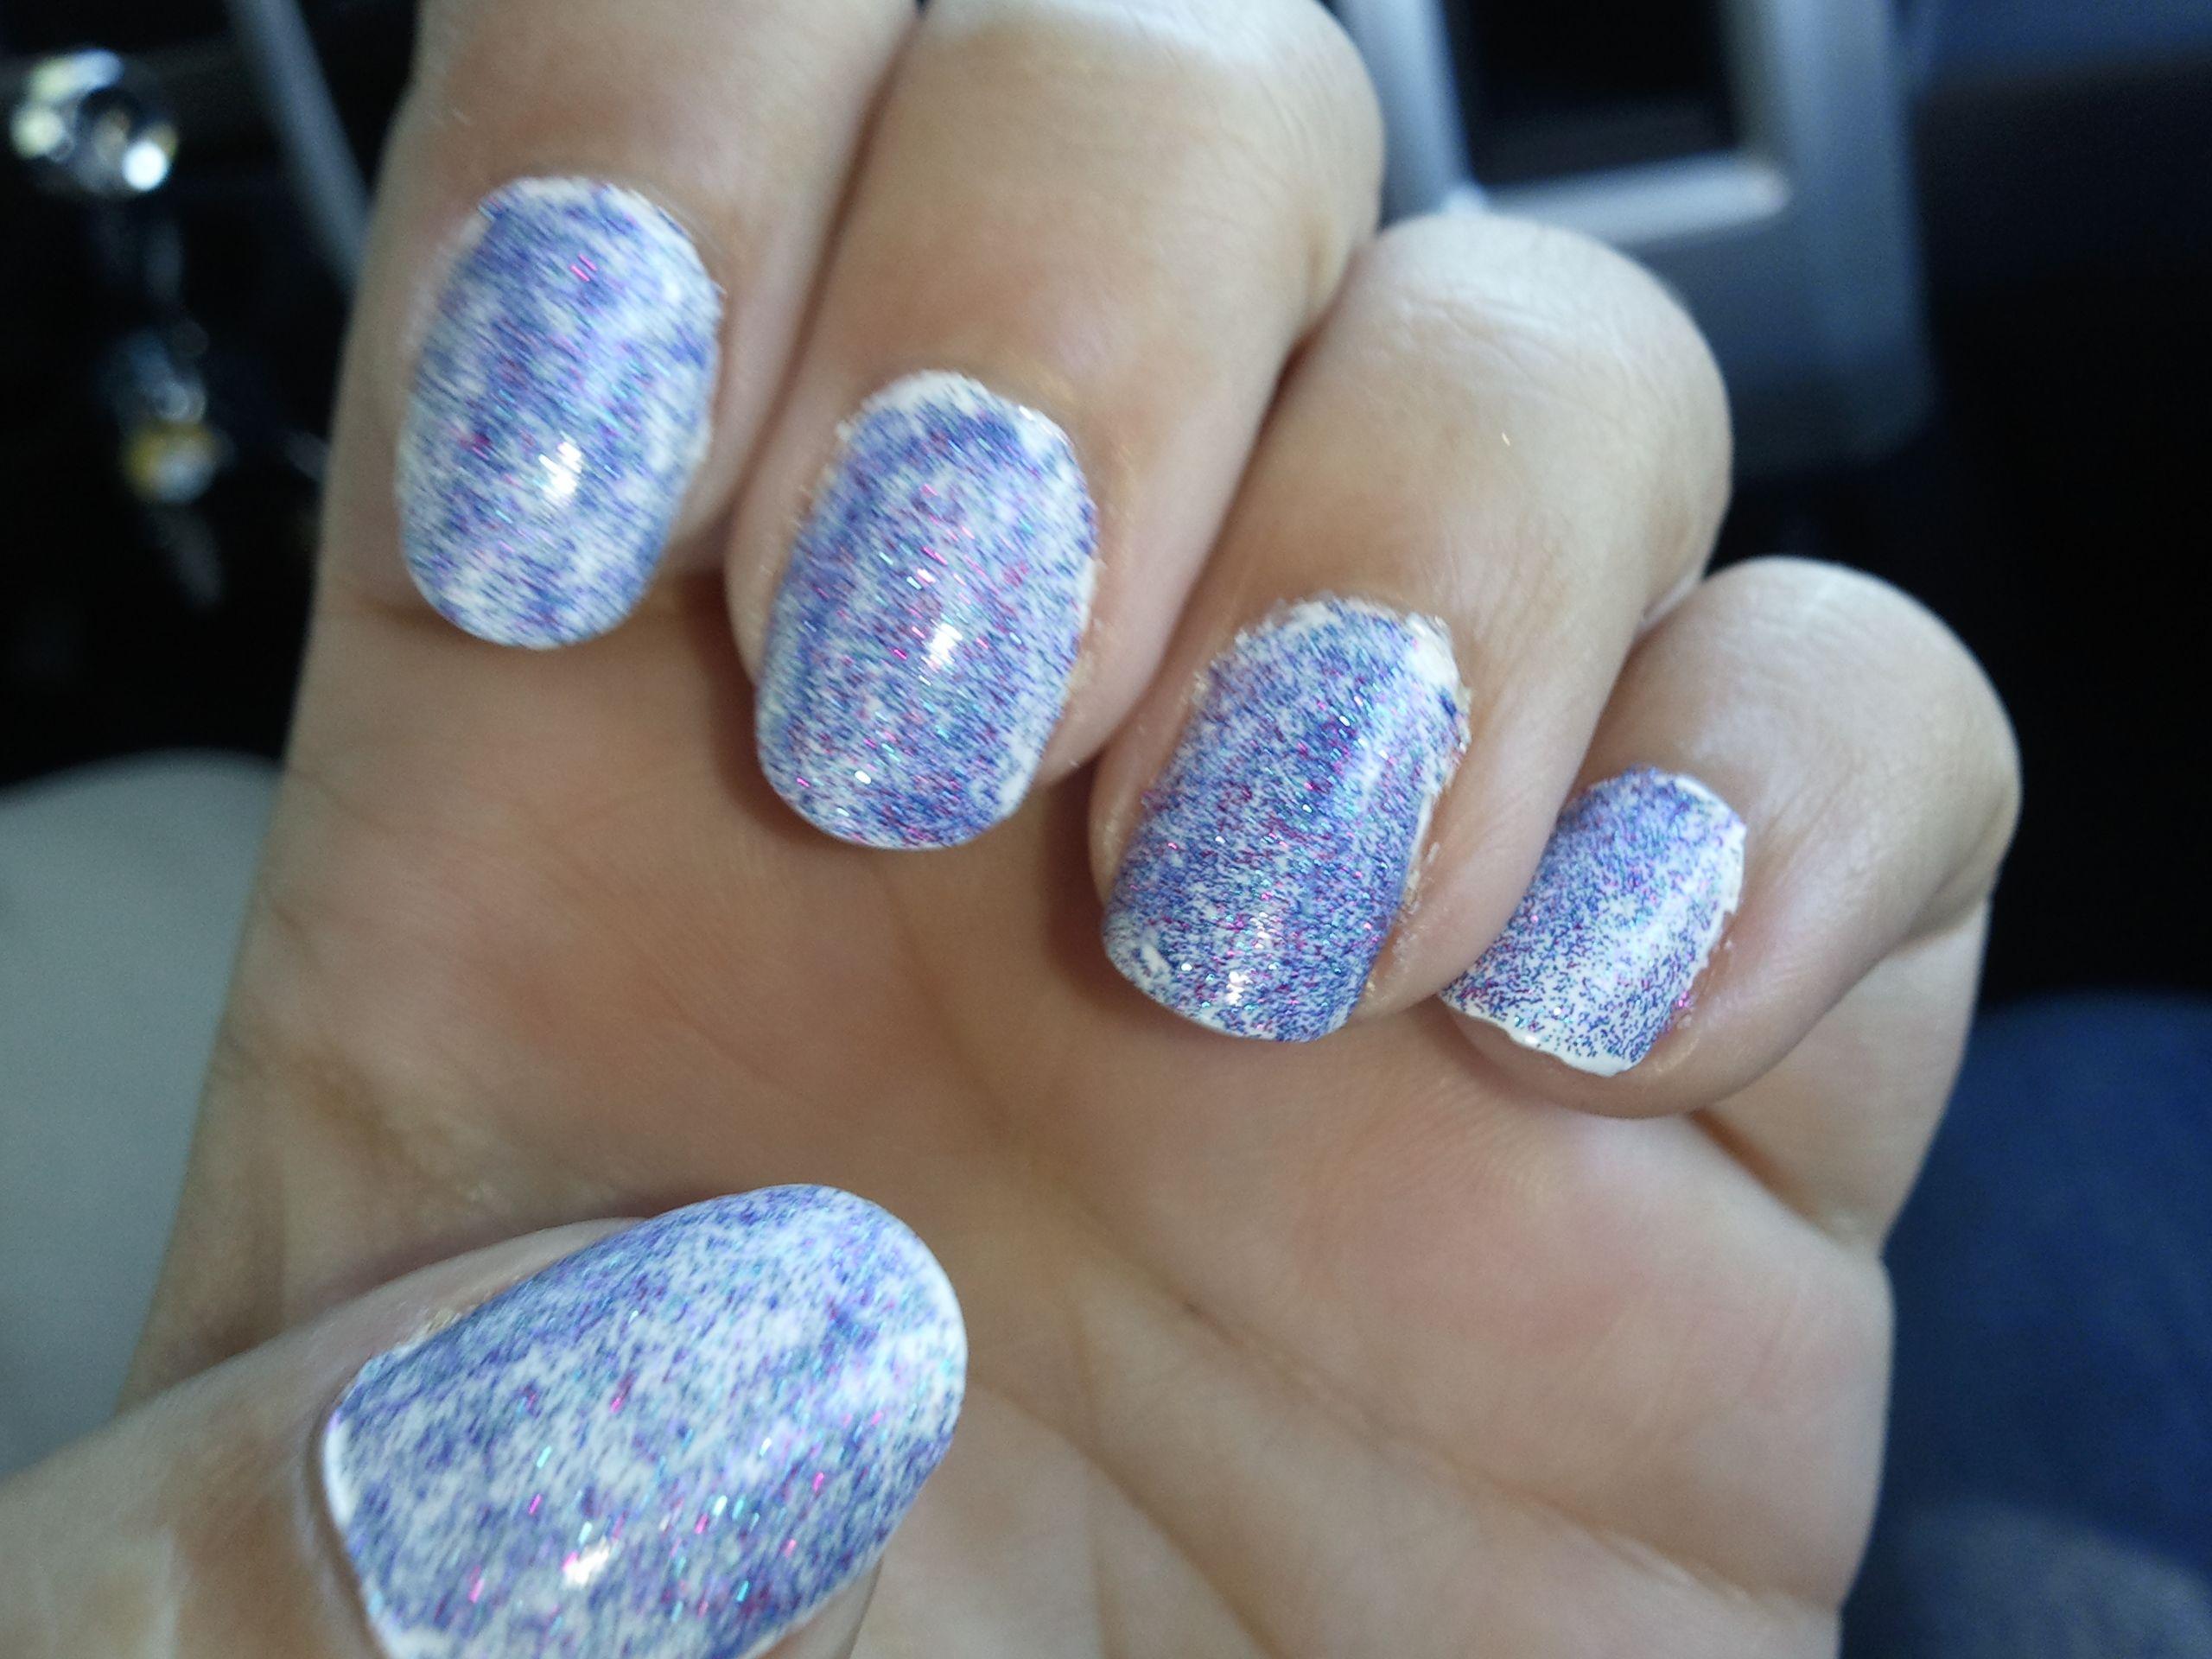 white nail polish (2 coats) purple and blue glitter polish (1 coat